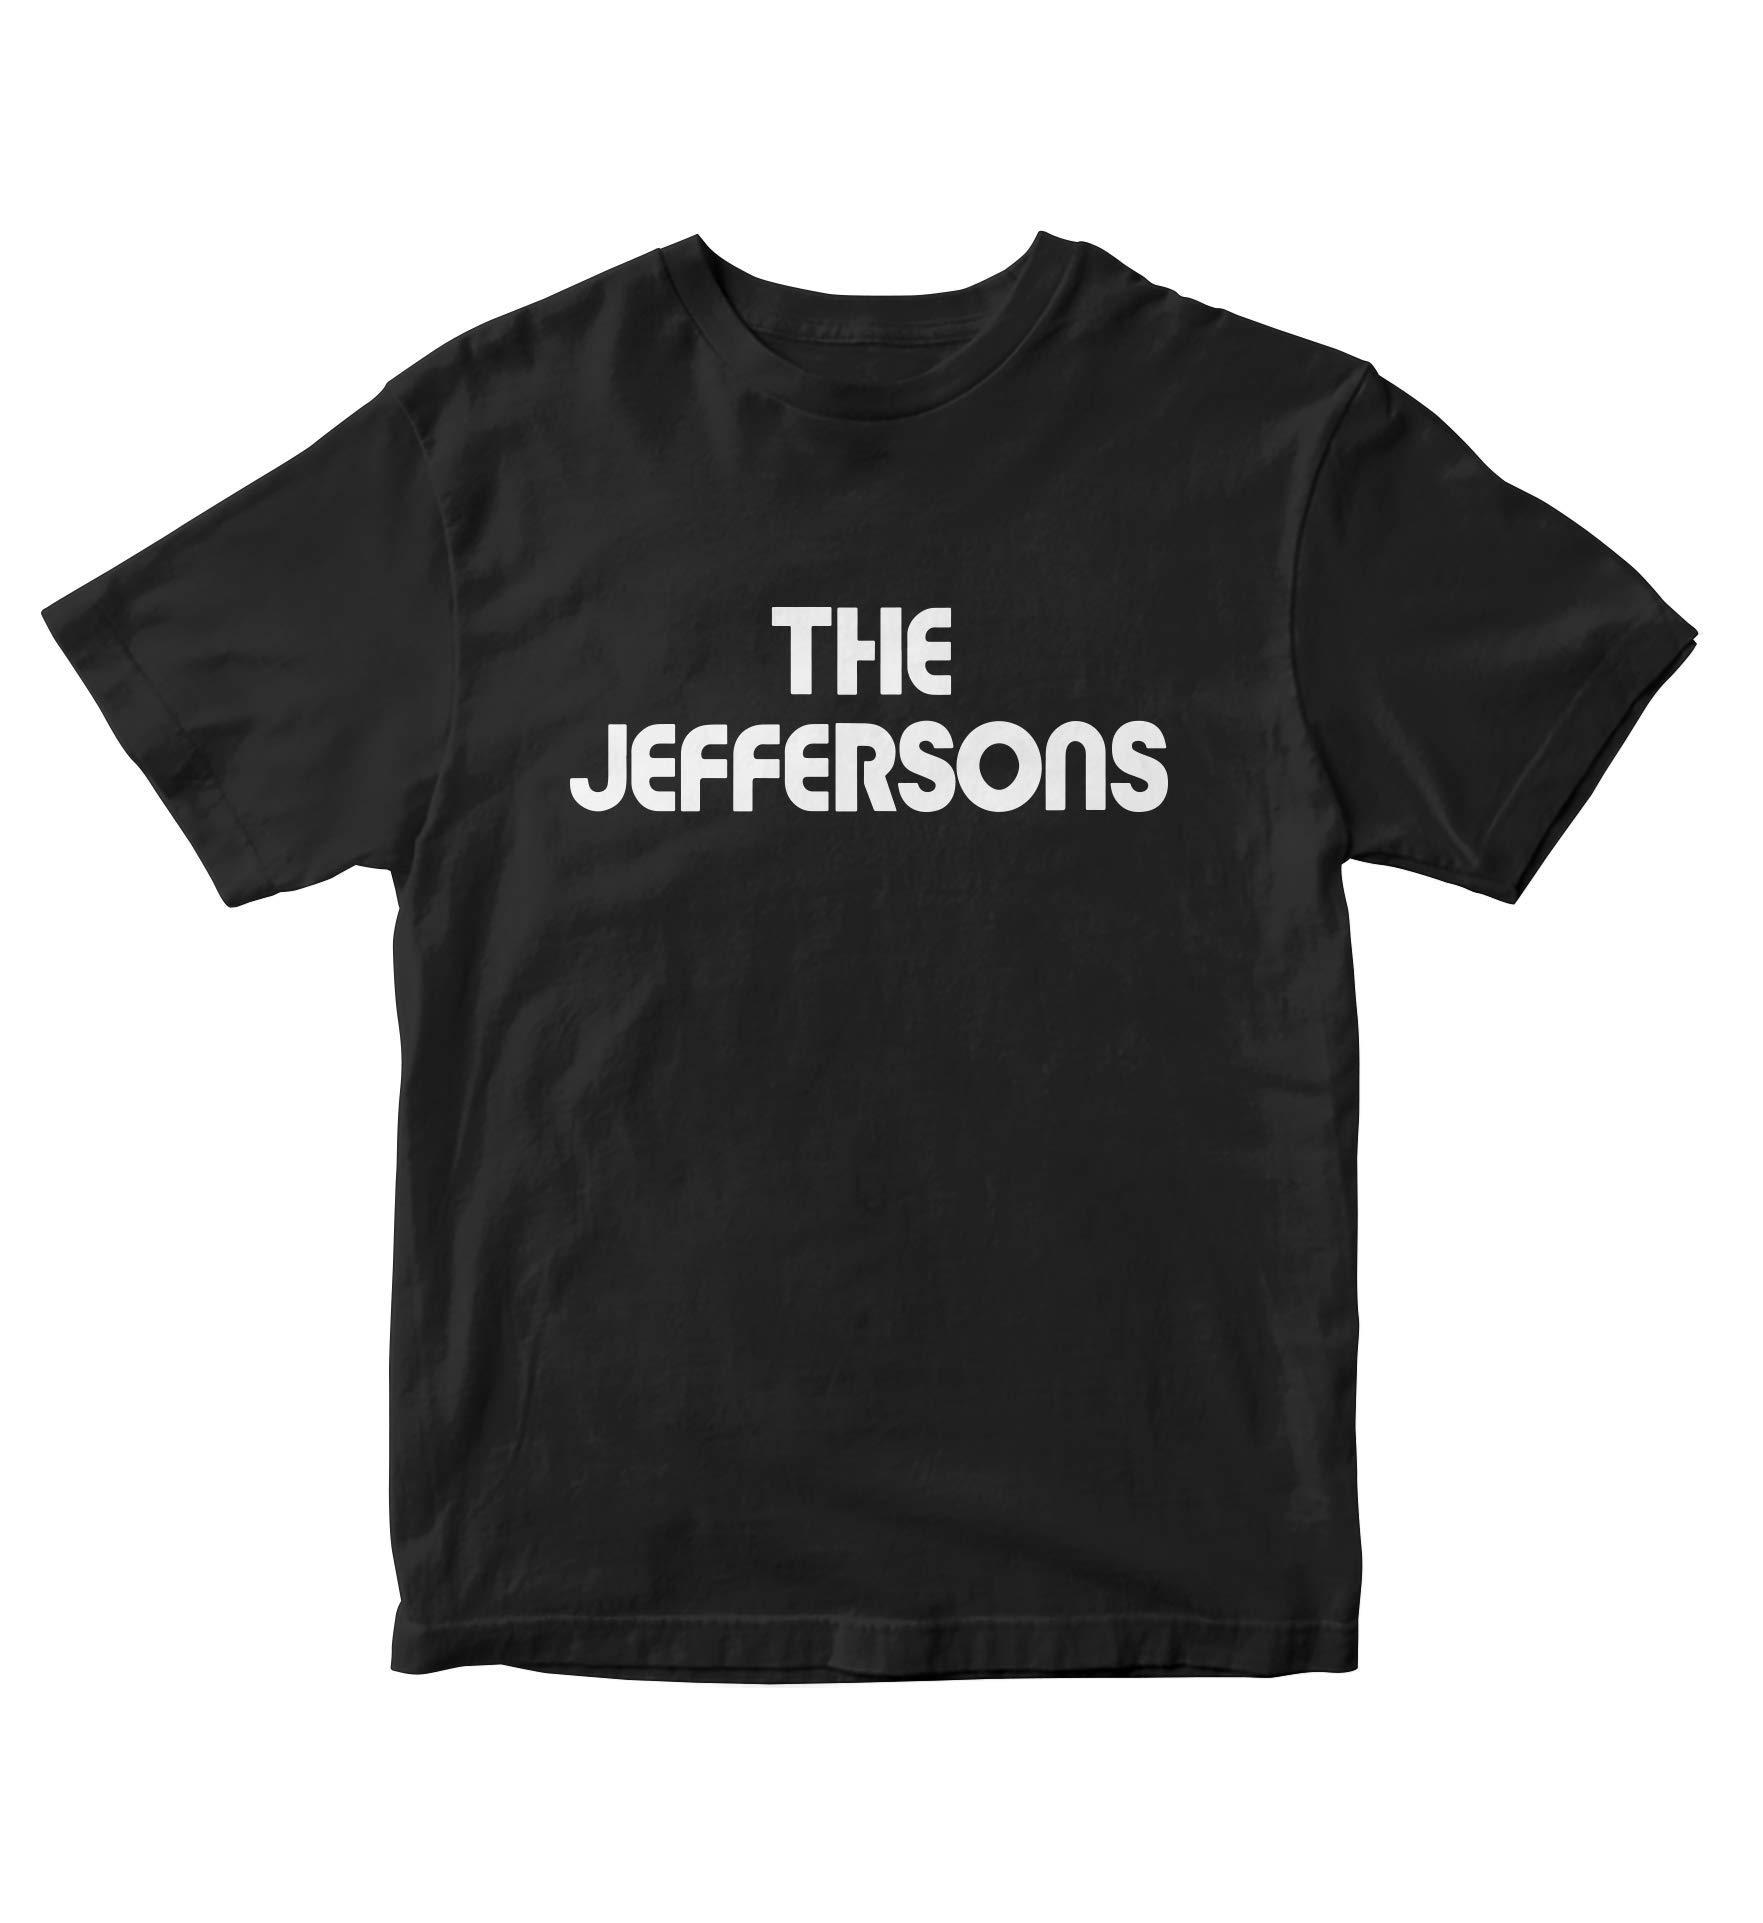 Tjsports The Jeffersons Black Shirt S Tv Show M162